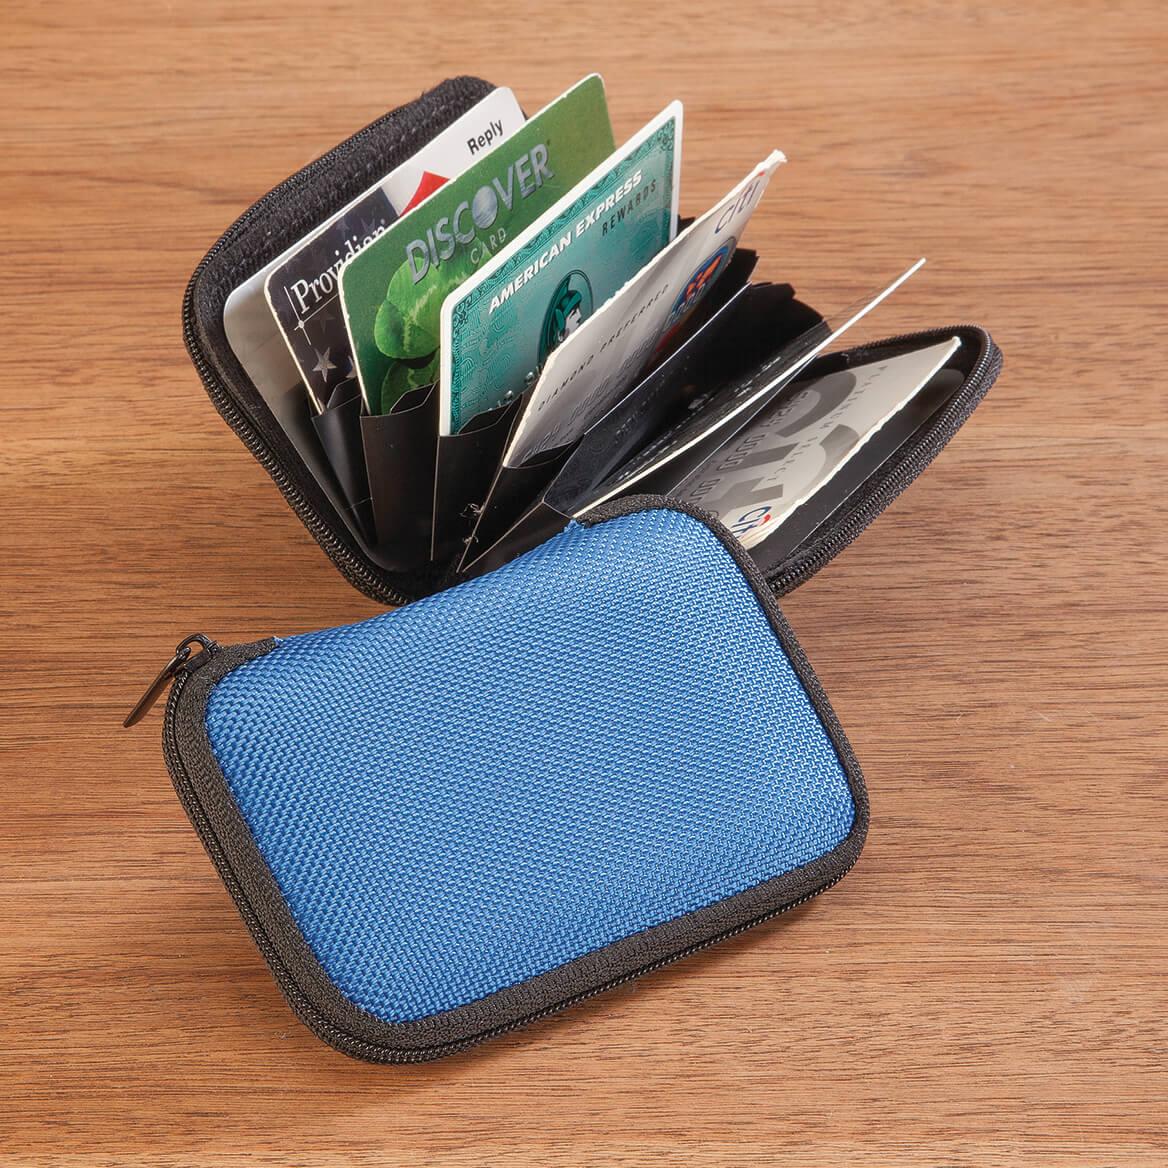 24de9394b9c3 Plastic Wallet Inserts - Photo Wallet Inserts - Miles Kimball